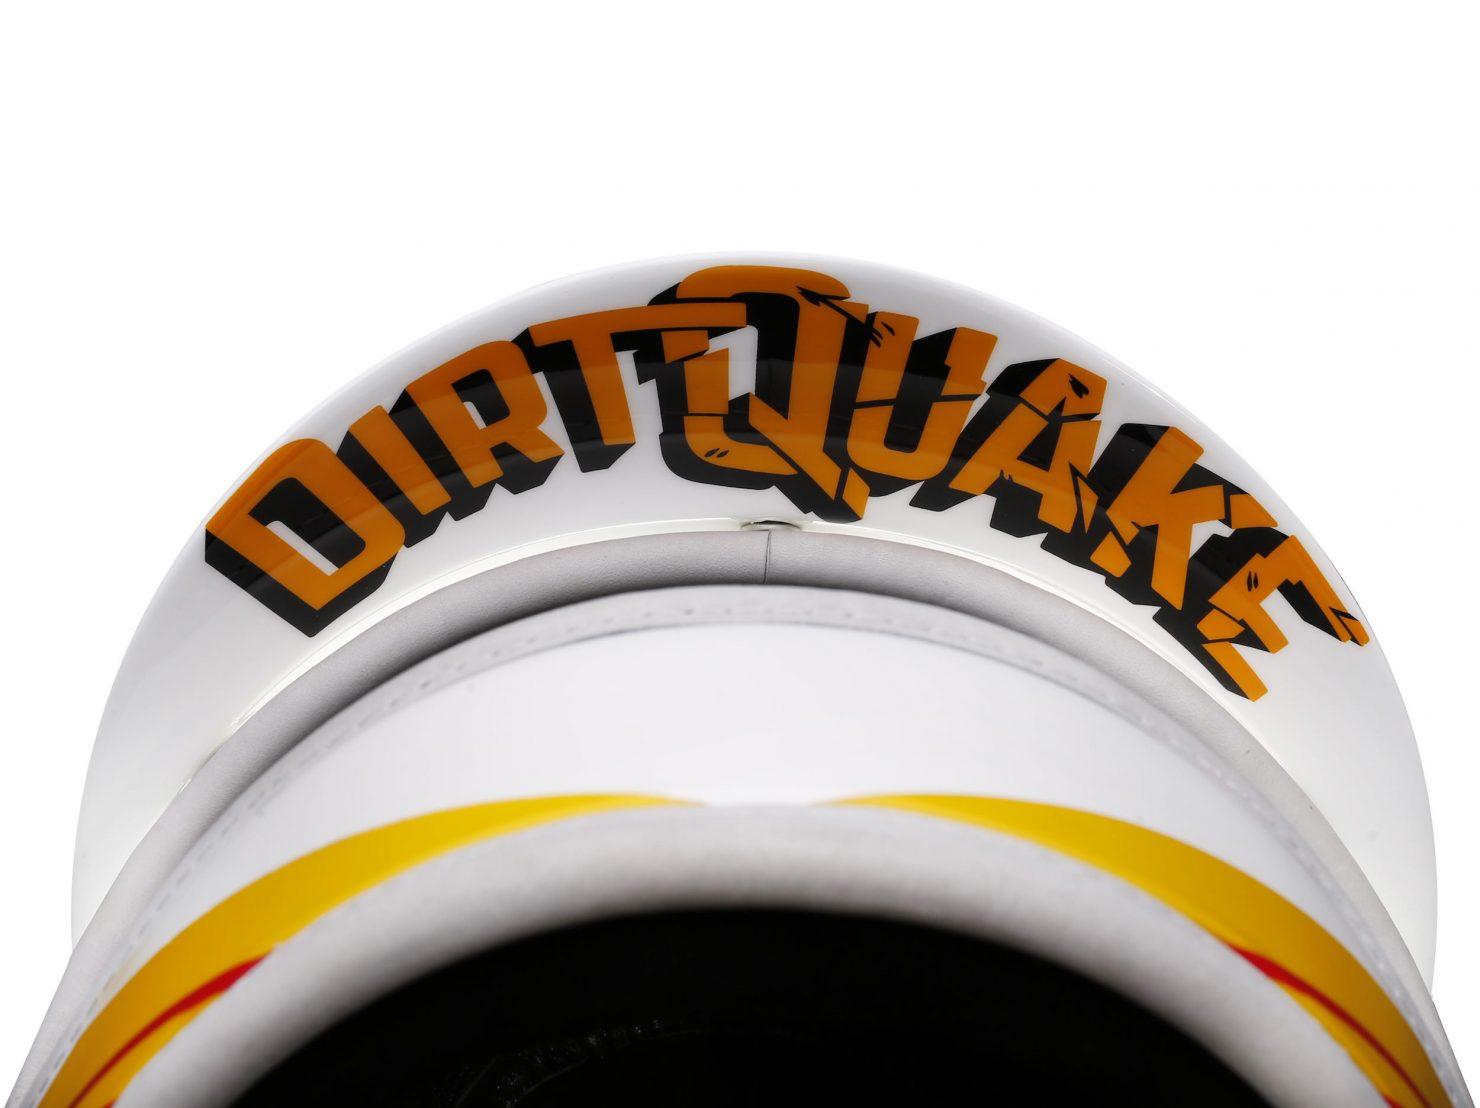 HEDON X DIRTQUAKE PEAK 1480x1108 - Hedon Heroine Dirt Quake Trailblazer Helmet